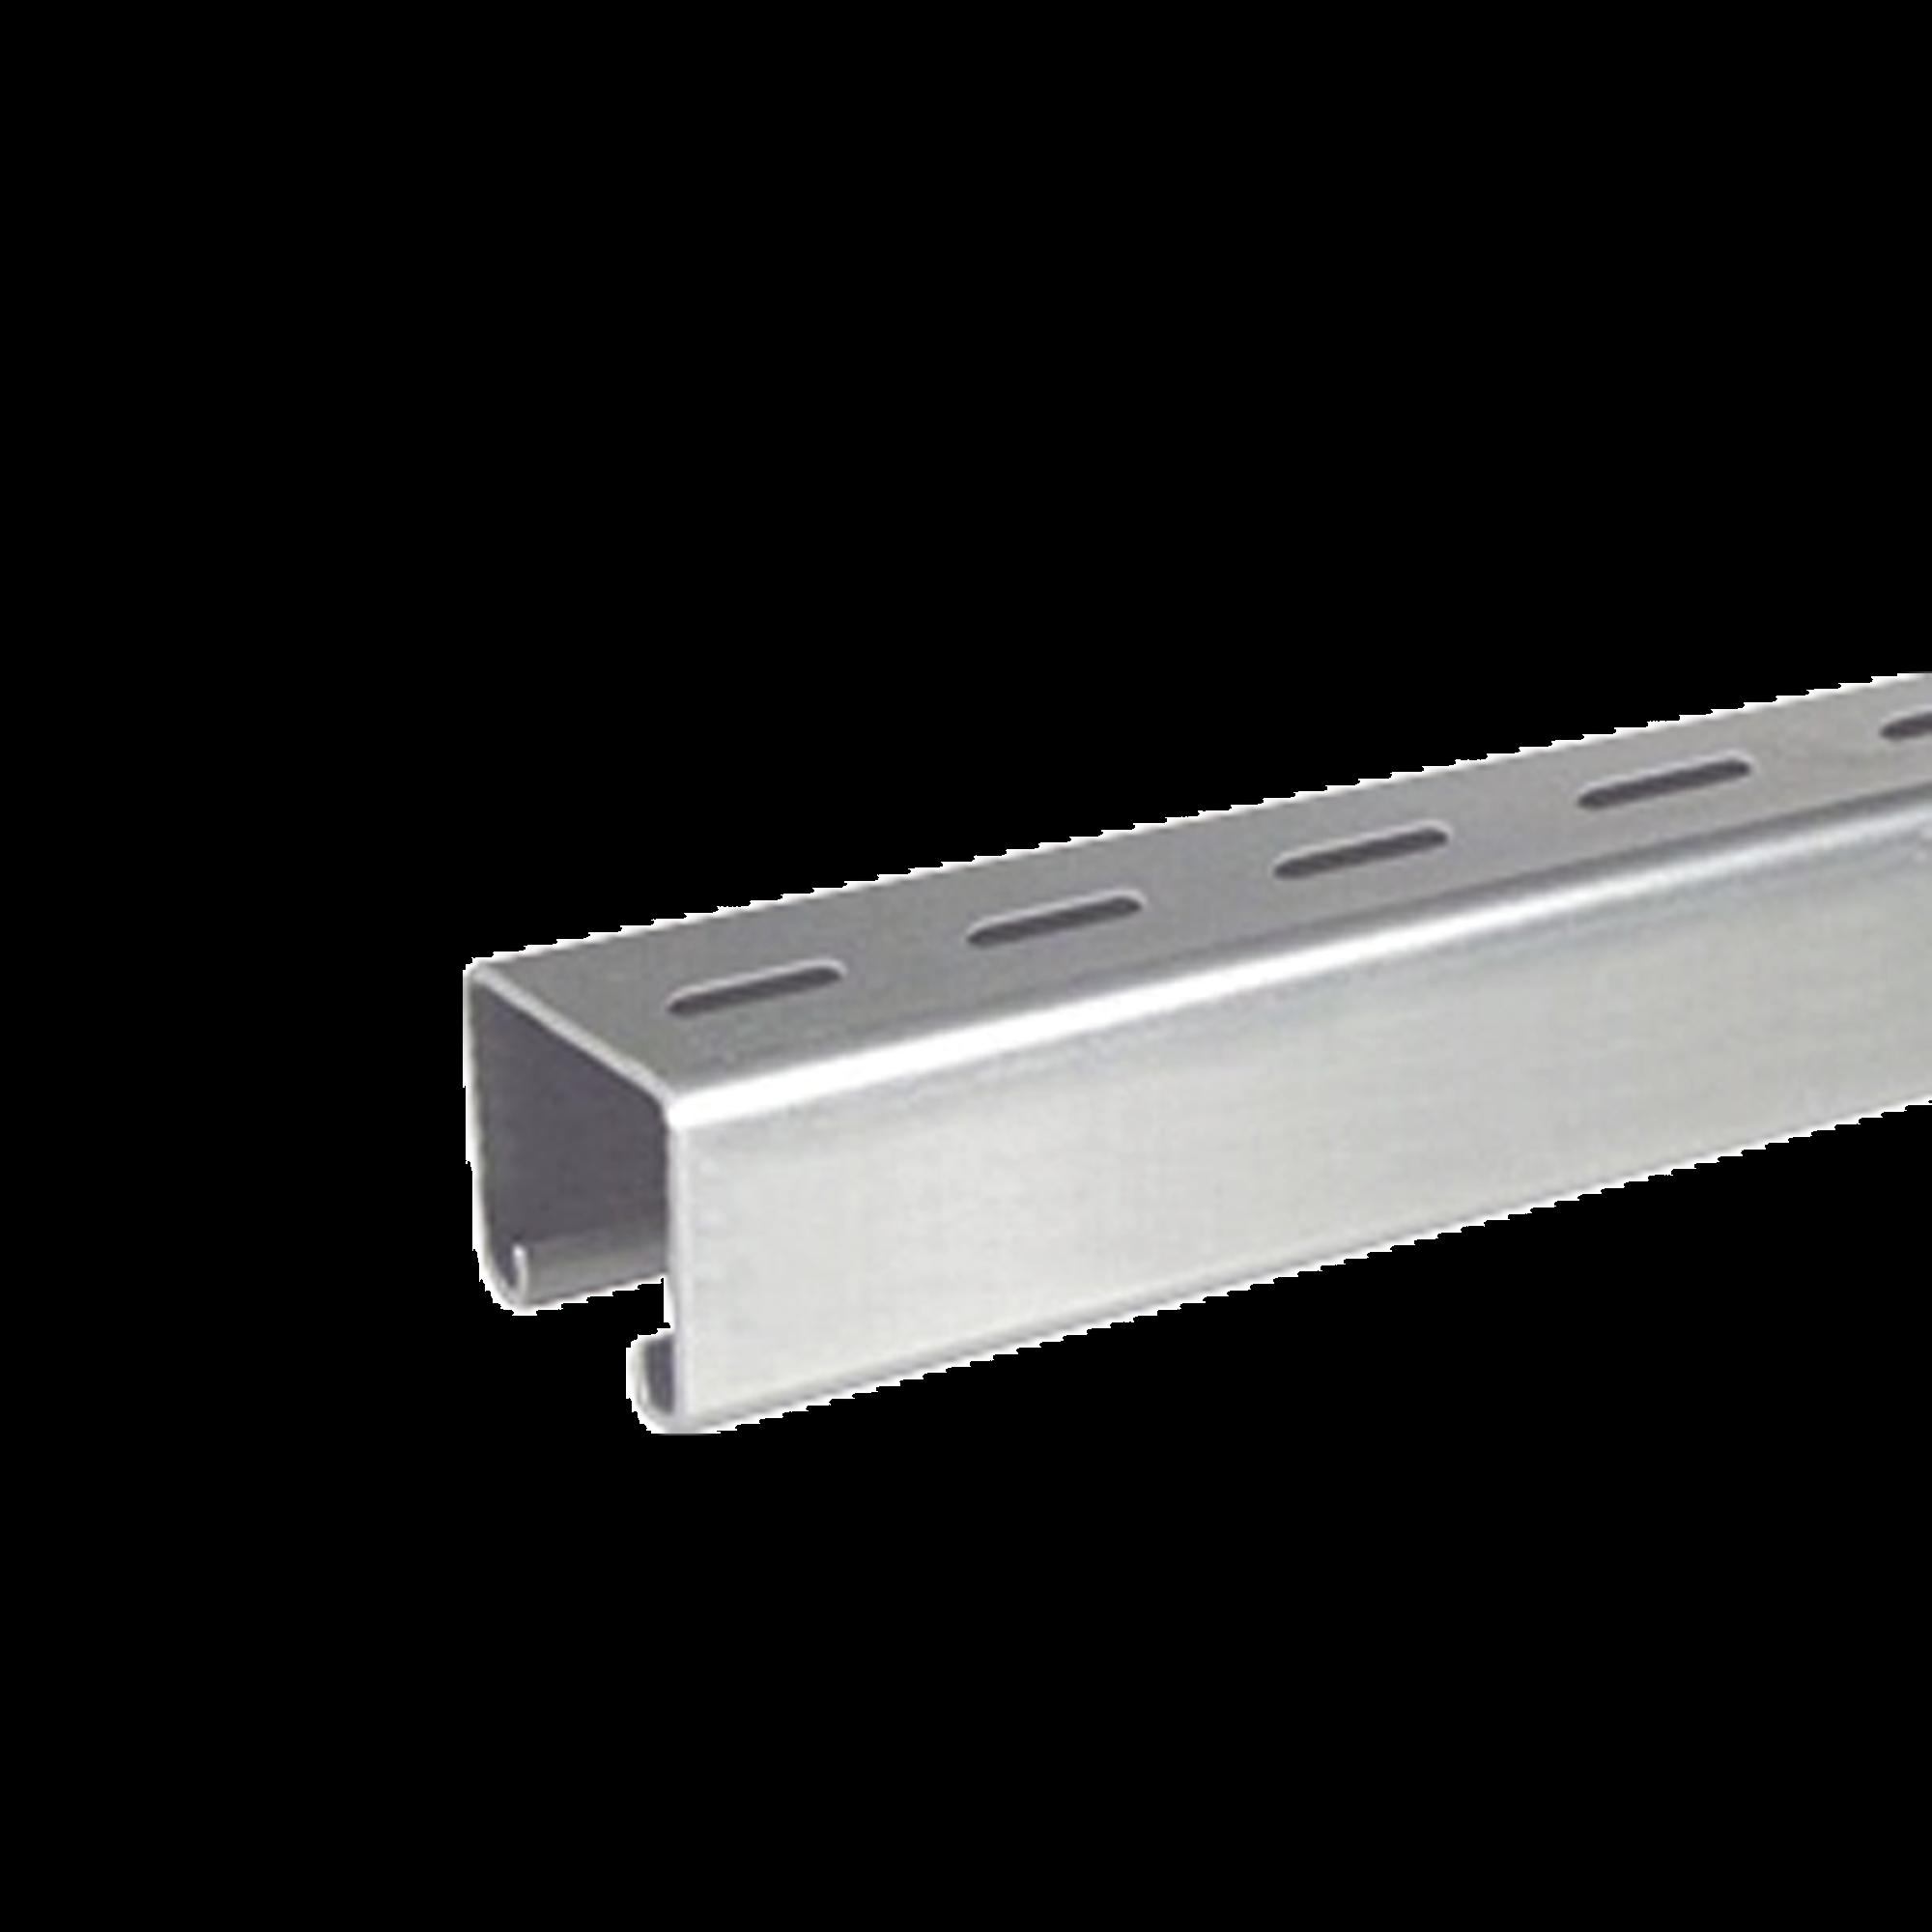 Unicanal Perforado 4 x 4 Calibre 16 de 3 metros.